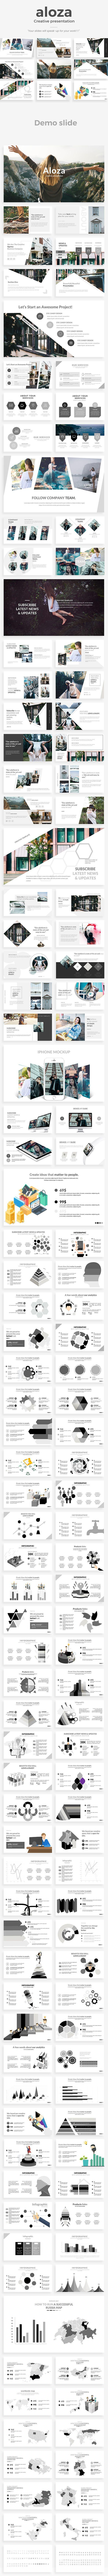 Aloza #Creative #Powerpoint Template - Creative PowerPoint Templates